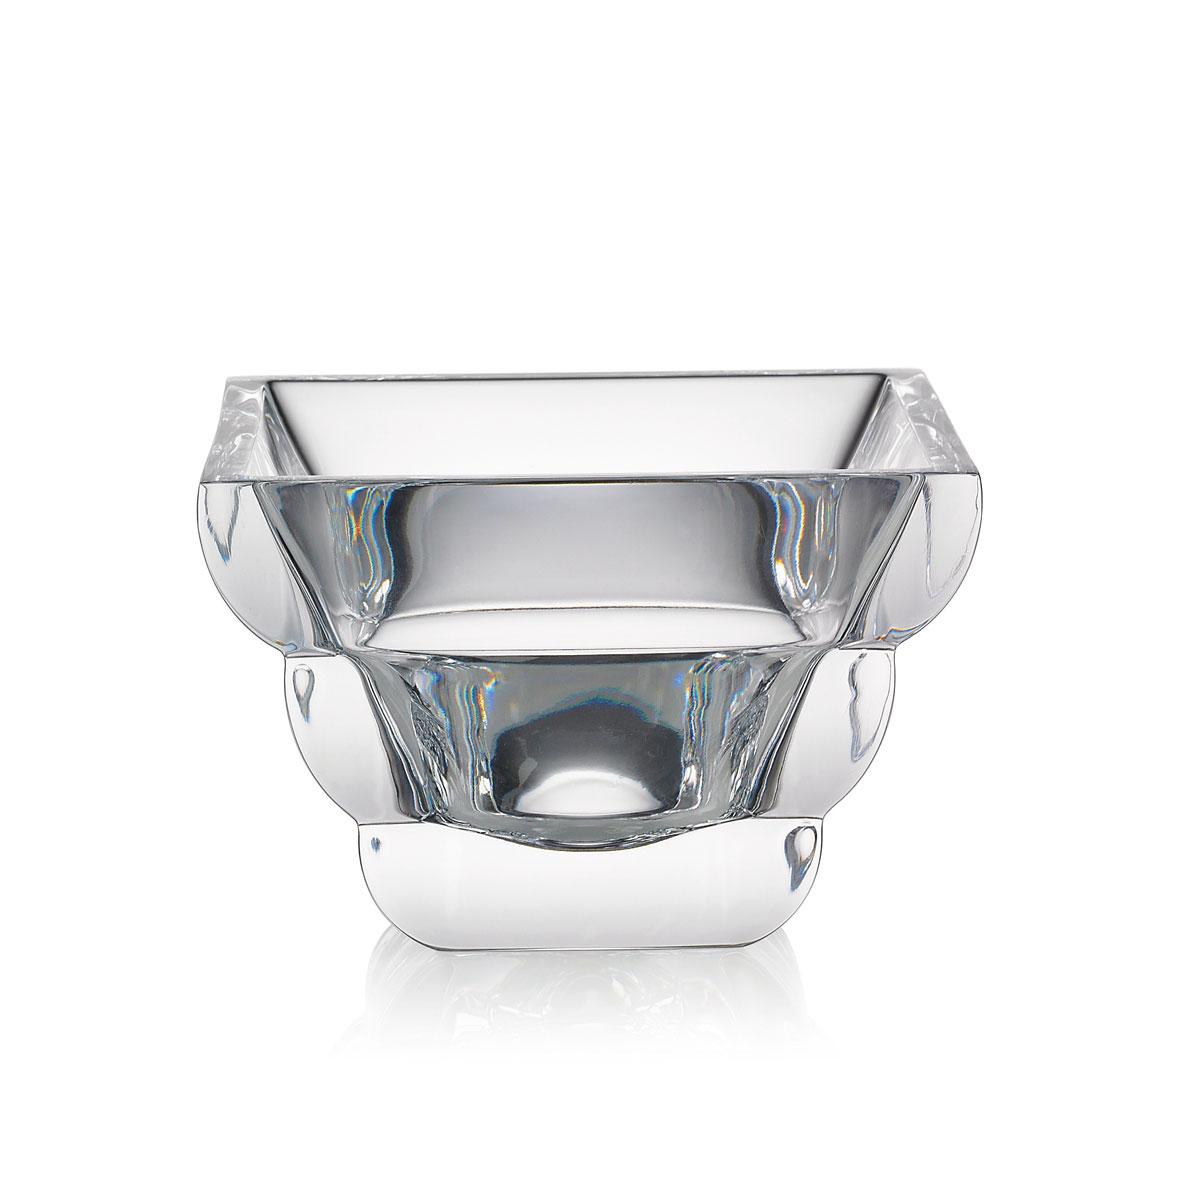 "Rogaska Crystal, Adria 4 1/2"" Crystal Bowl"